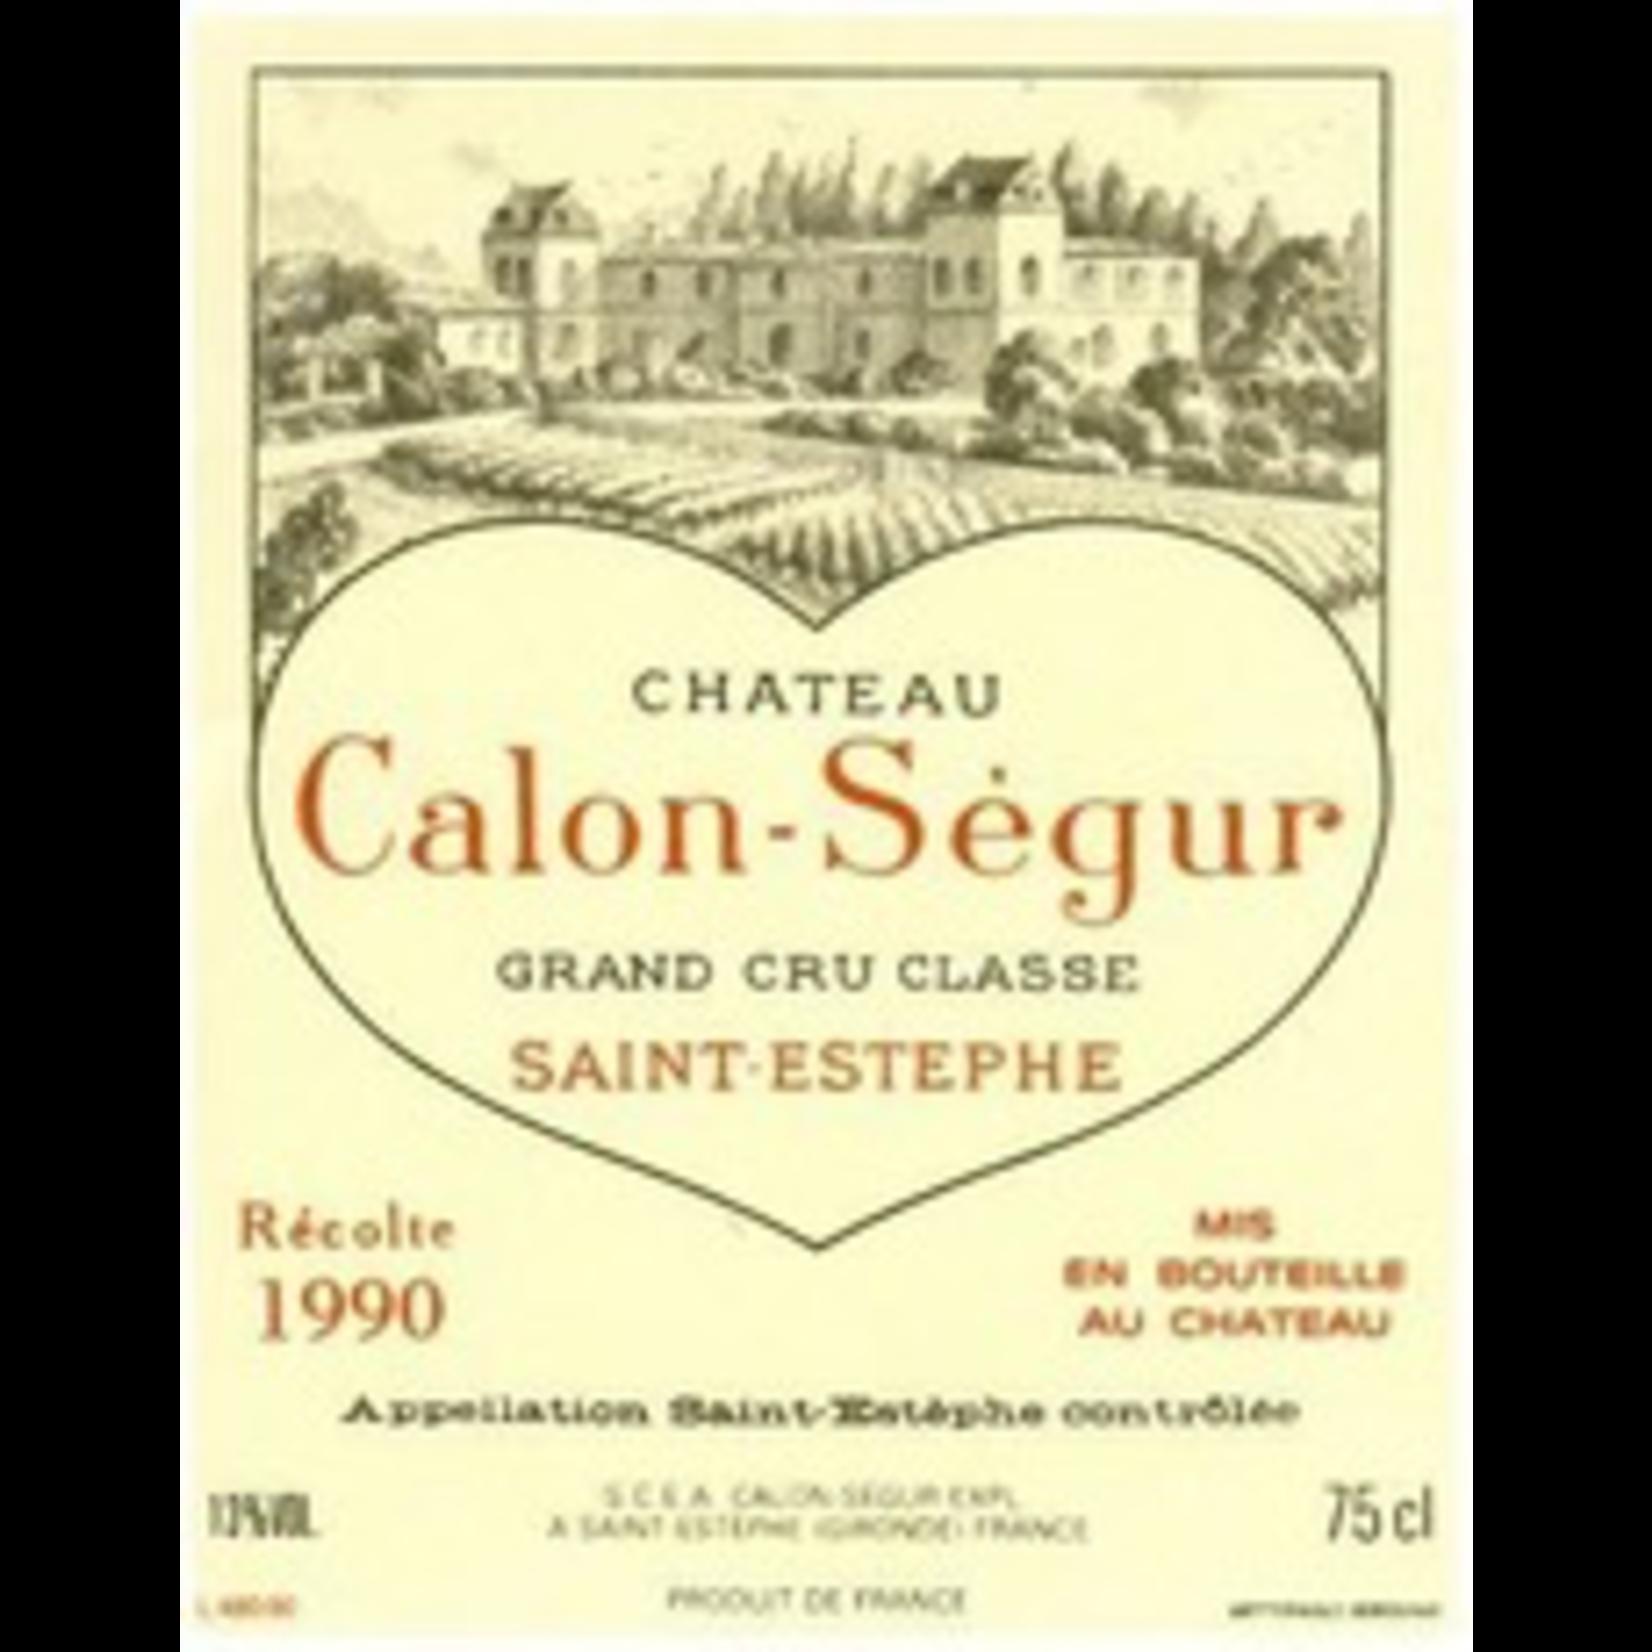 Wine Chateau Calon Segur 1990